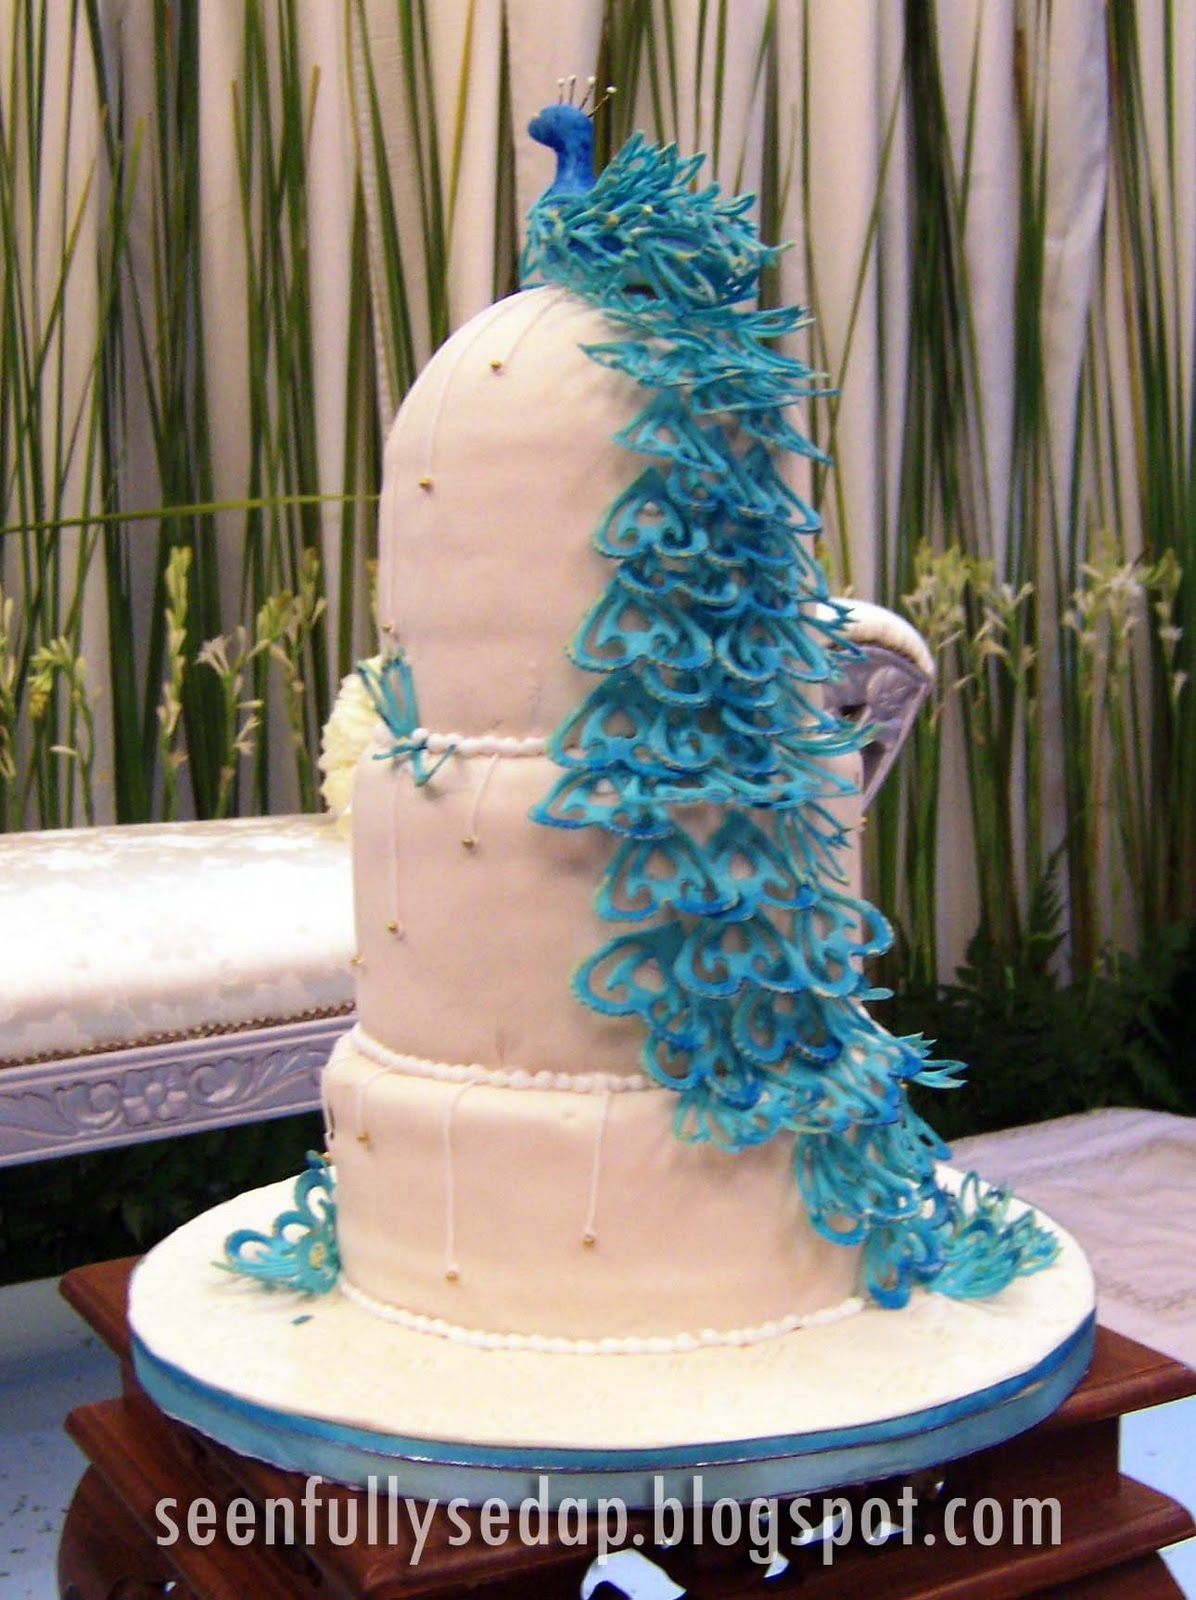 Seenfully Sedap: Wedding Cake